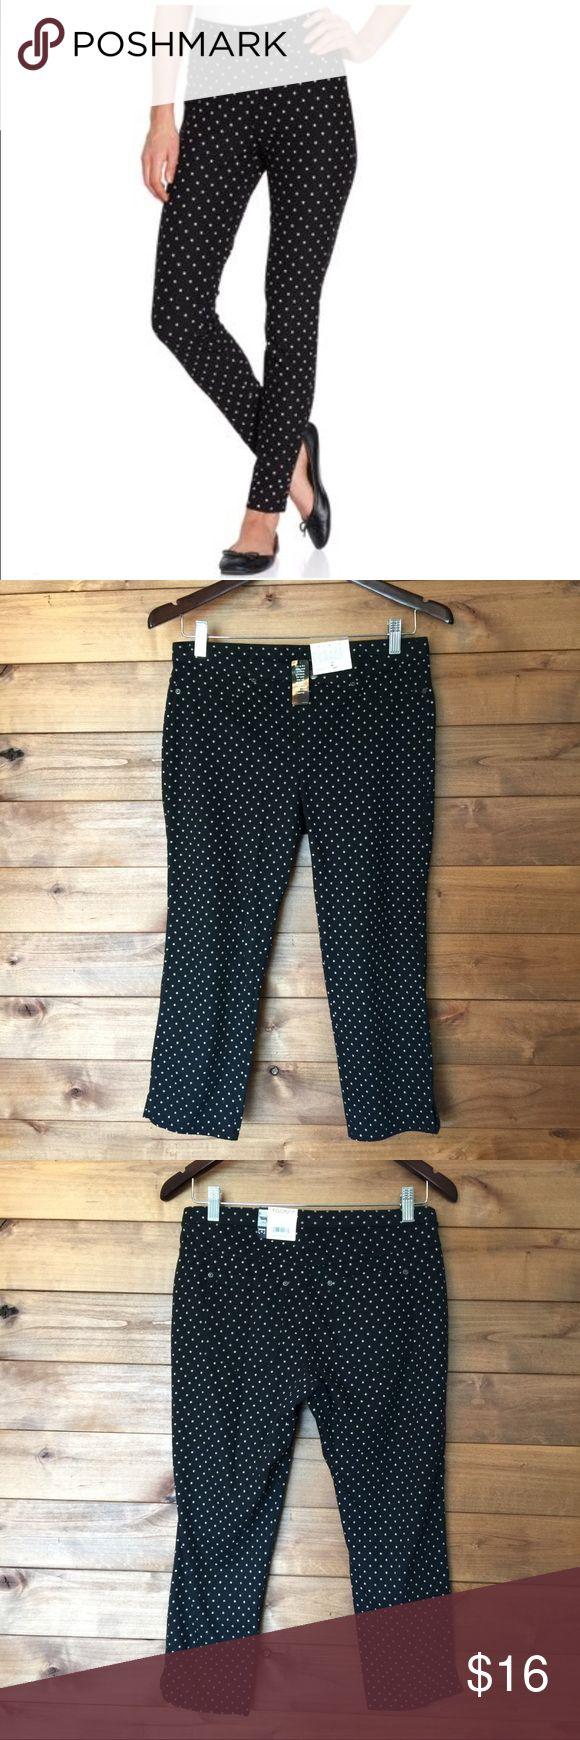 "HUE Polka Dot Leggings Jeggings Polka dot Jean leggings. Black & White. Real back pockets..Faux front pockets. New with tags. 52% cotton 38"" Polyester 10%  Inseam: 21"" HUE Pants Leggings"